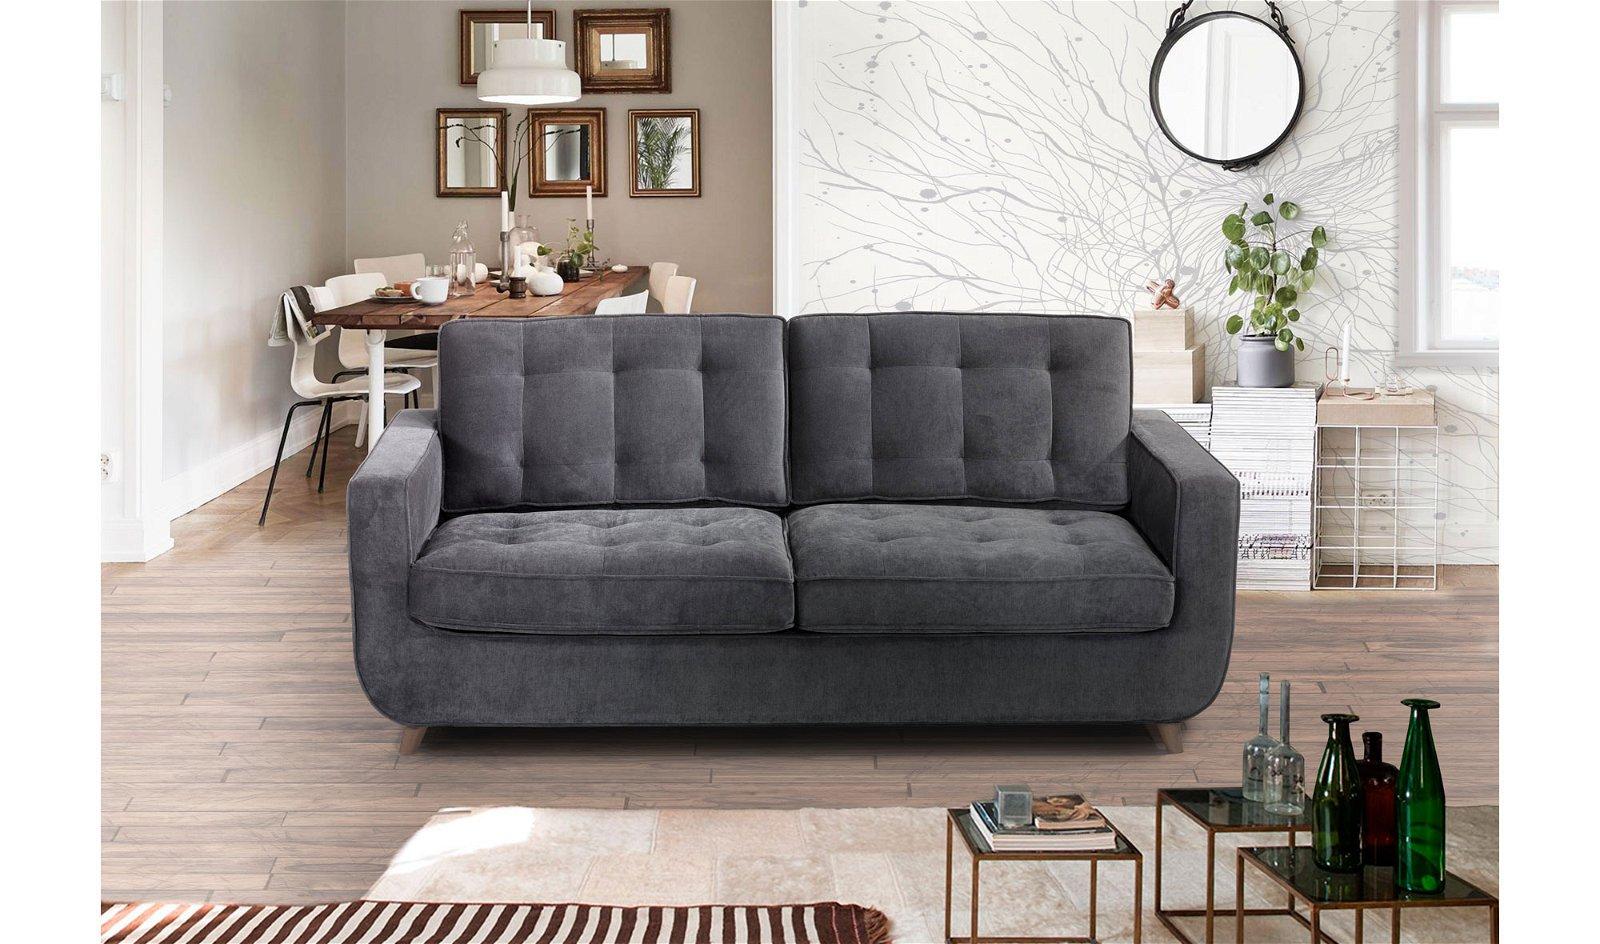 Sofá cama retro Sterling Cooper